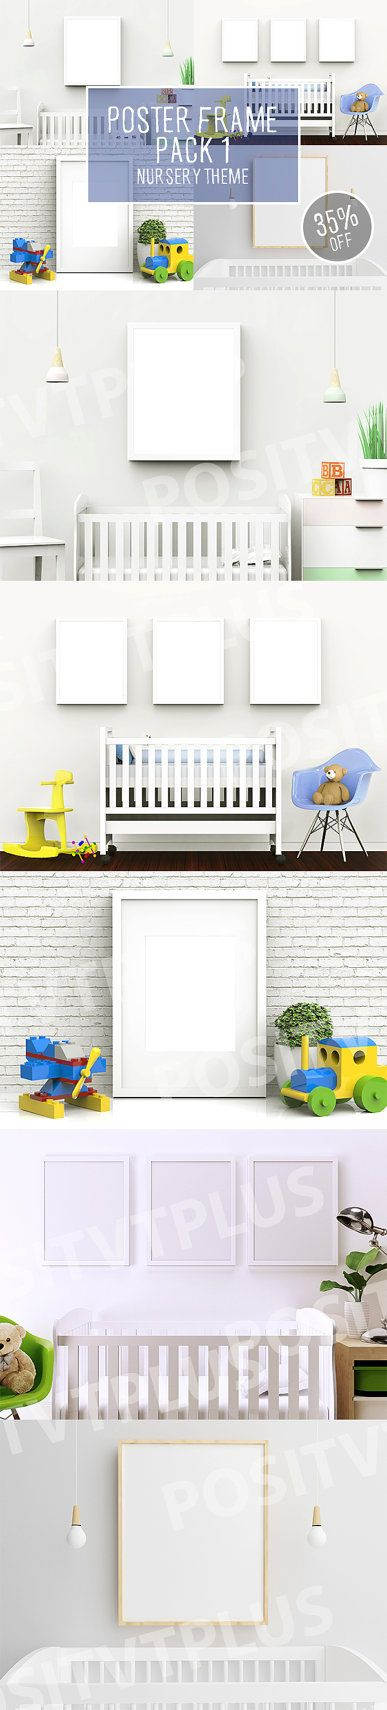 Poster Frame Pack 1  Nursery Theme / frame mockup / by Positvtplus                                                                                                                                                      More